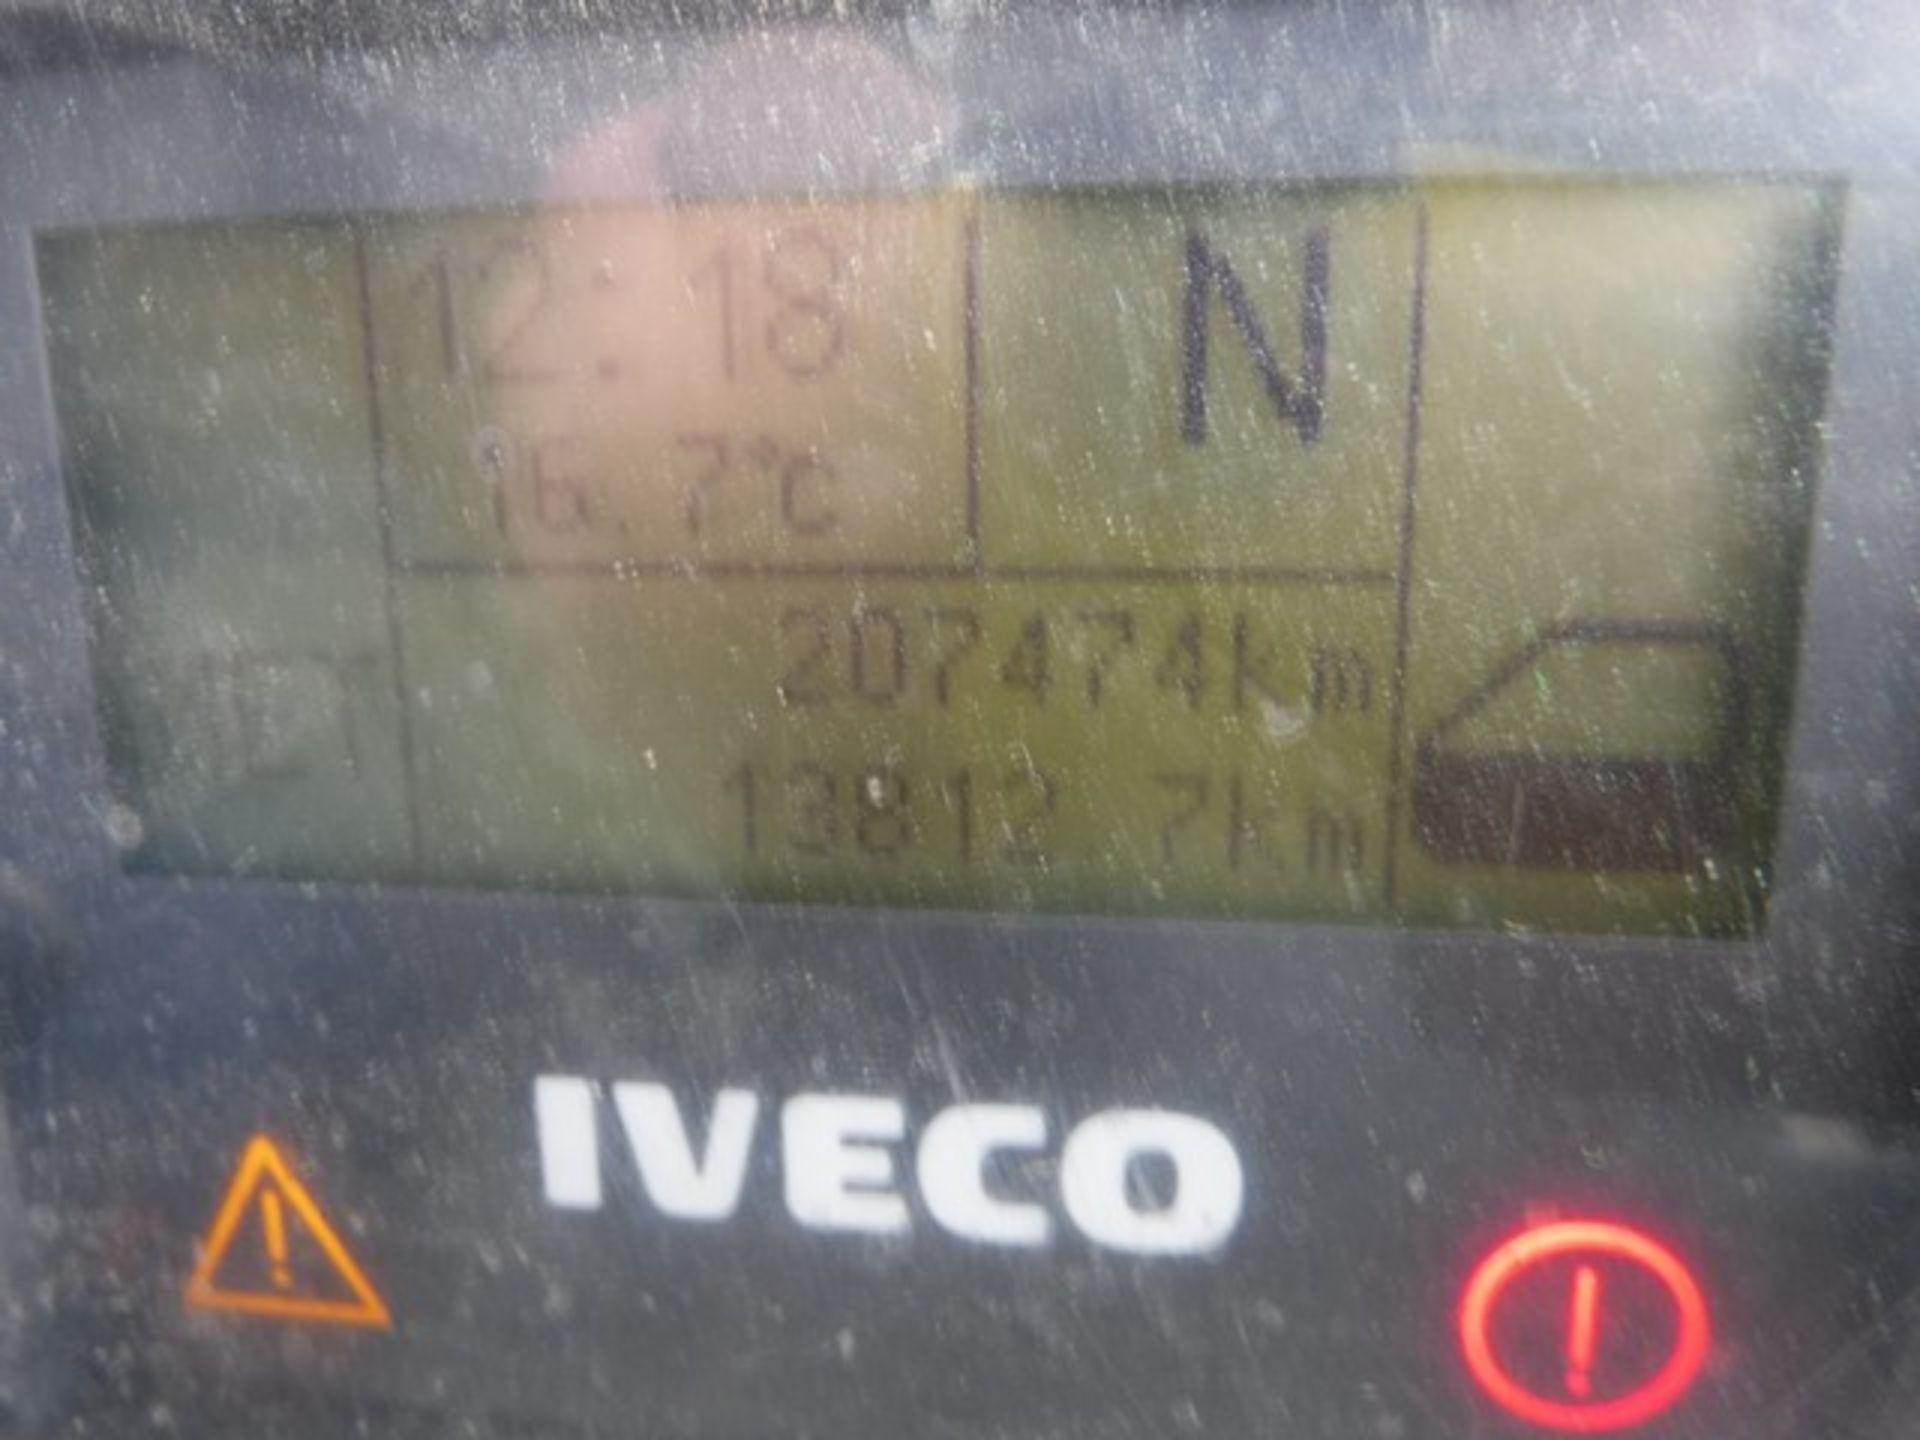 Lot 1702 - IVECO EUROCARGO - 3920cc